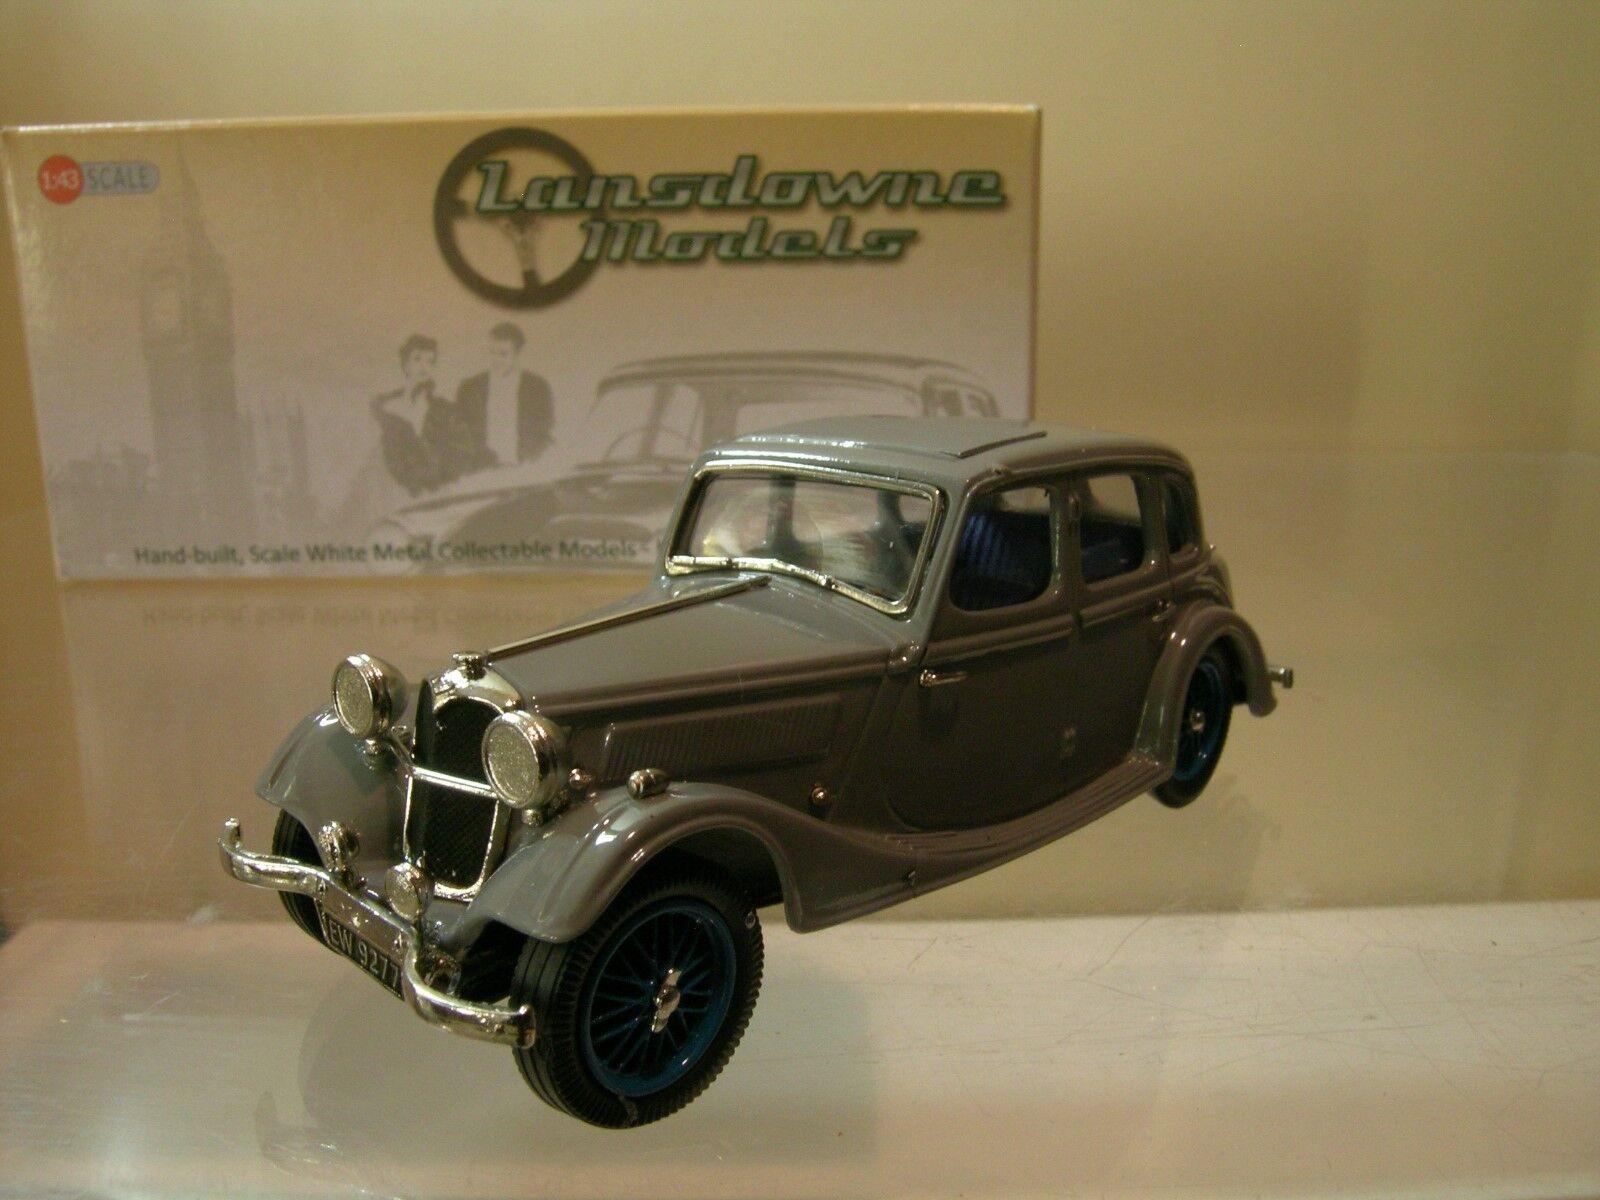 suministro de productos de calidad LANSDOWNE MODELS MODELS MODELS LDM 91 RILEY ADELPHI SALOON 1936 COLOUR gris + BOX SCALE 1 43  de moda